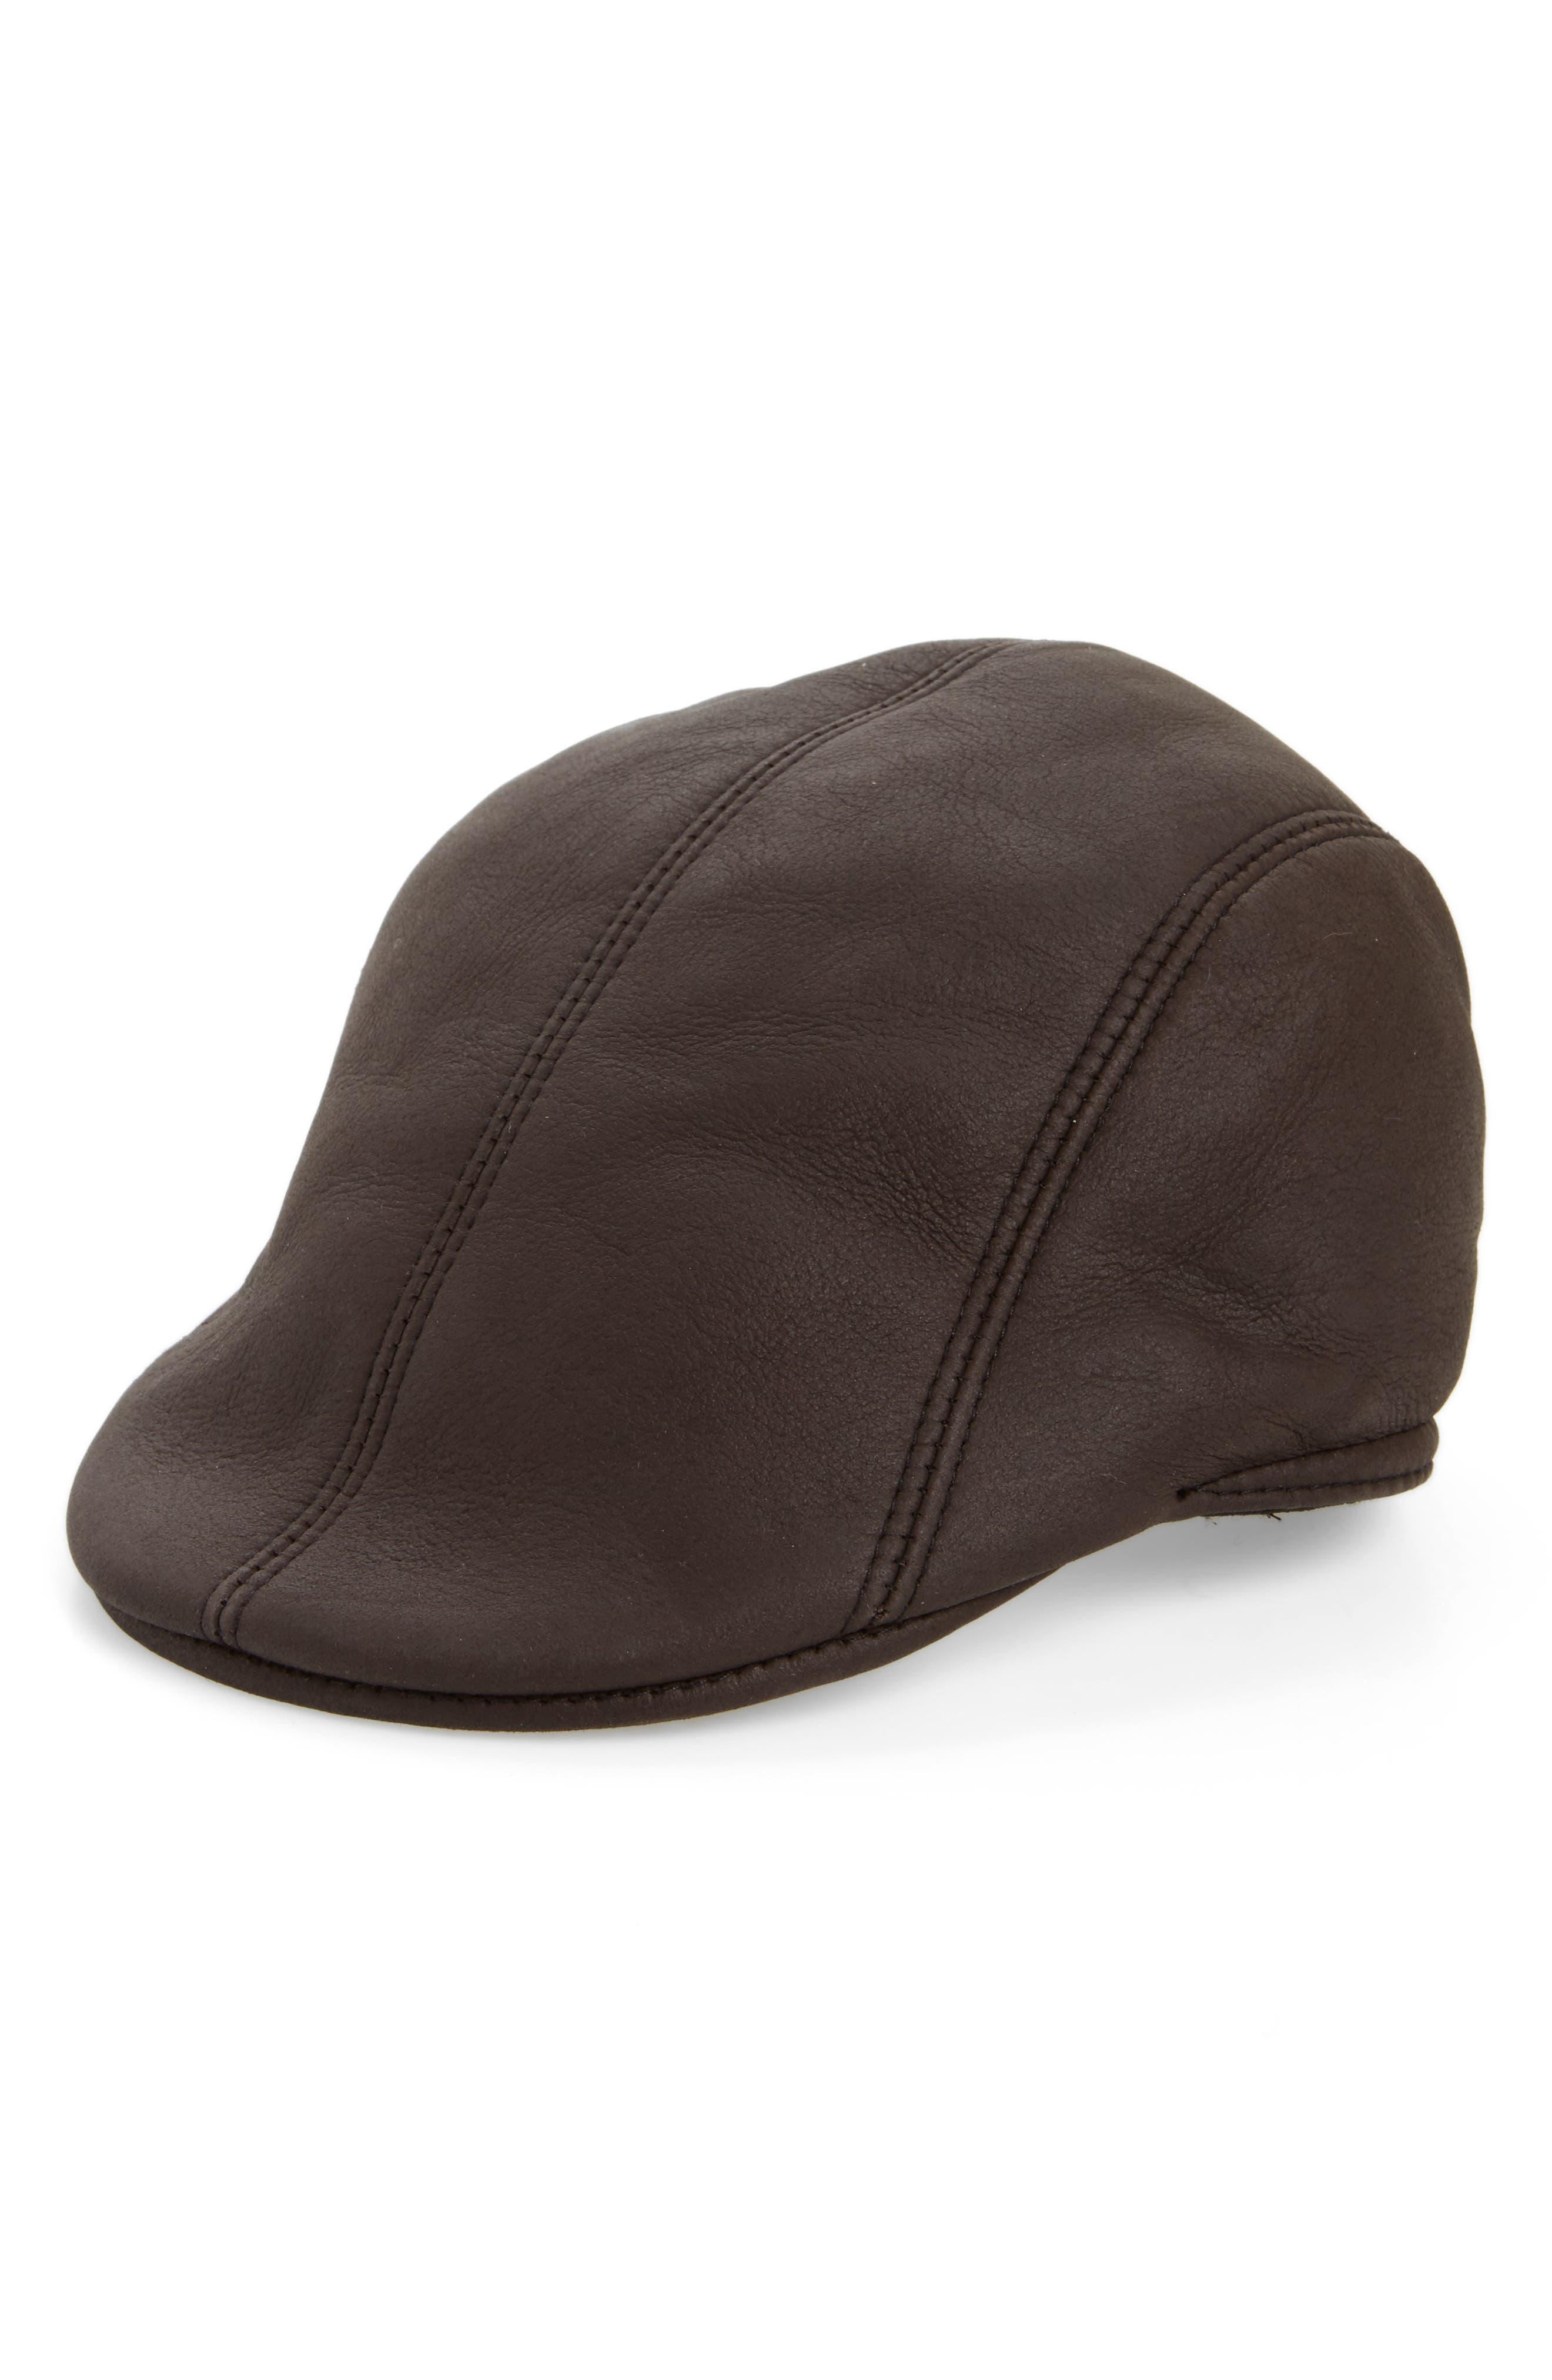 Main Image - Crown Cap Genuine Shearling Leather Driving Cap